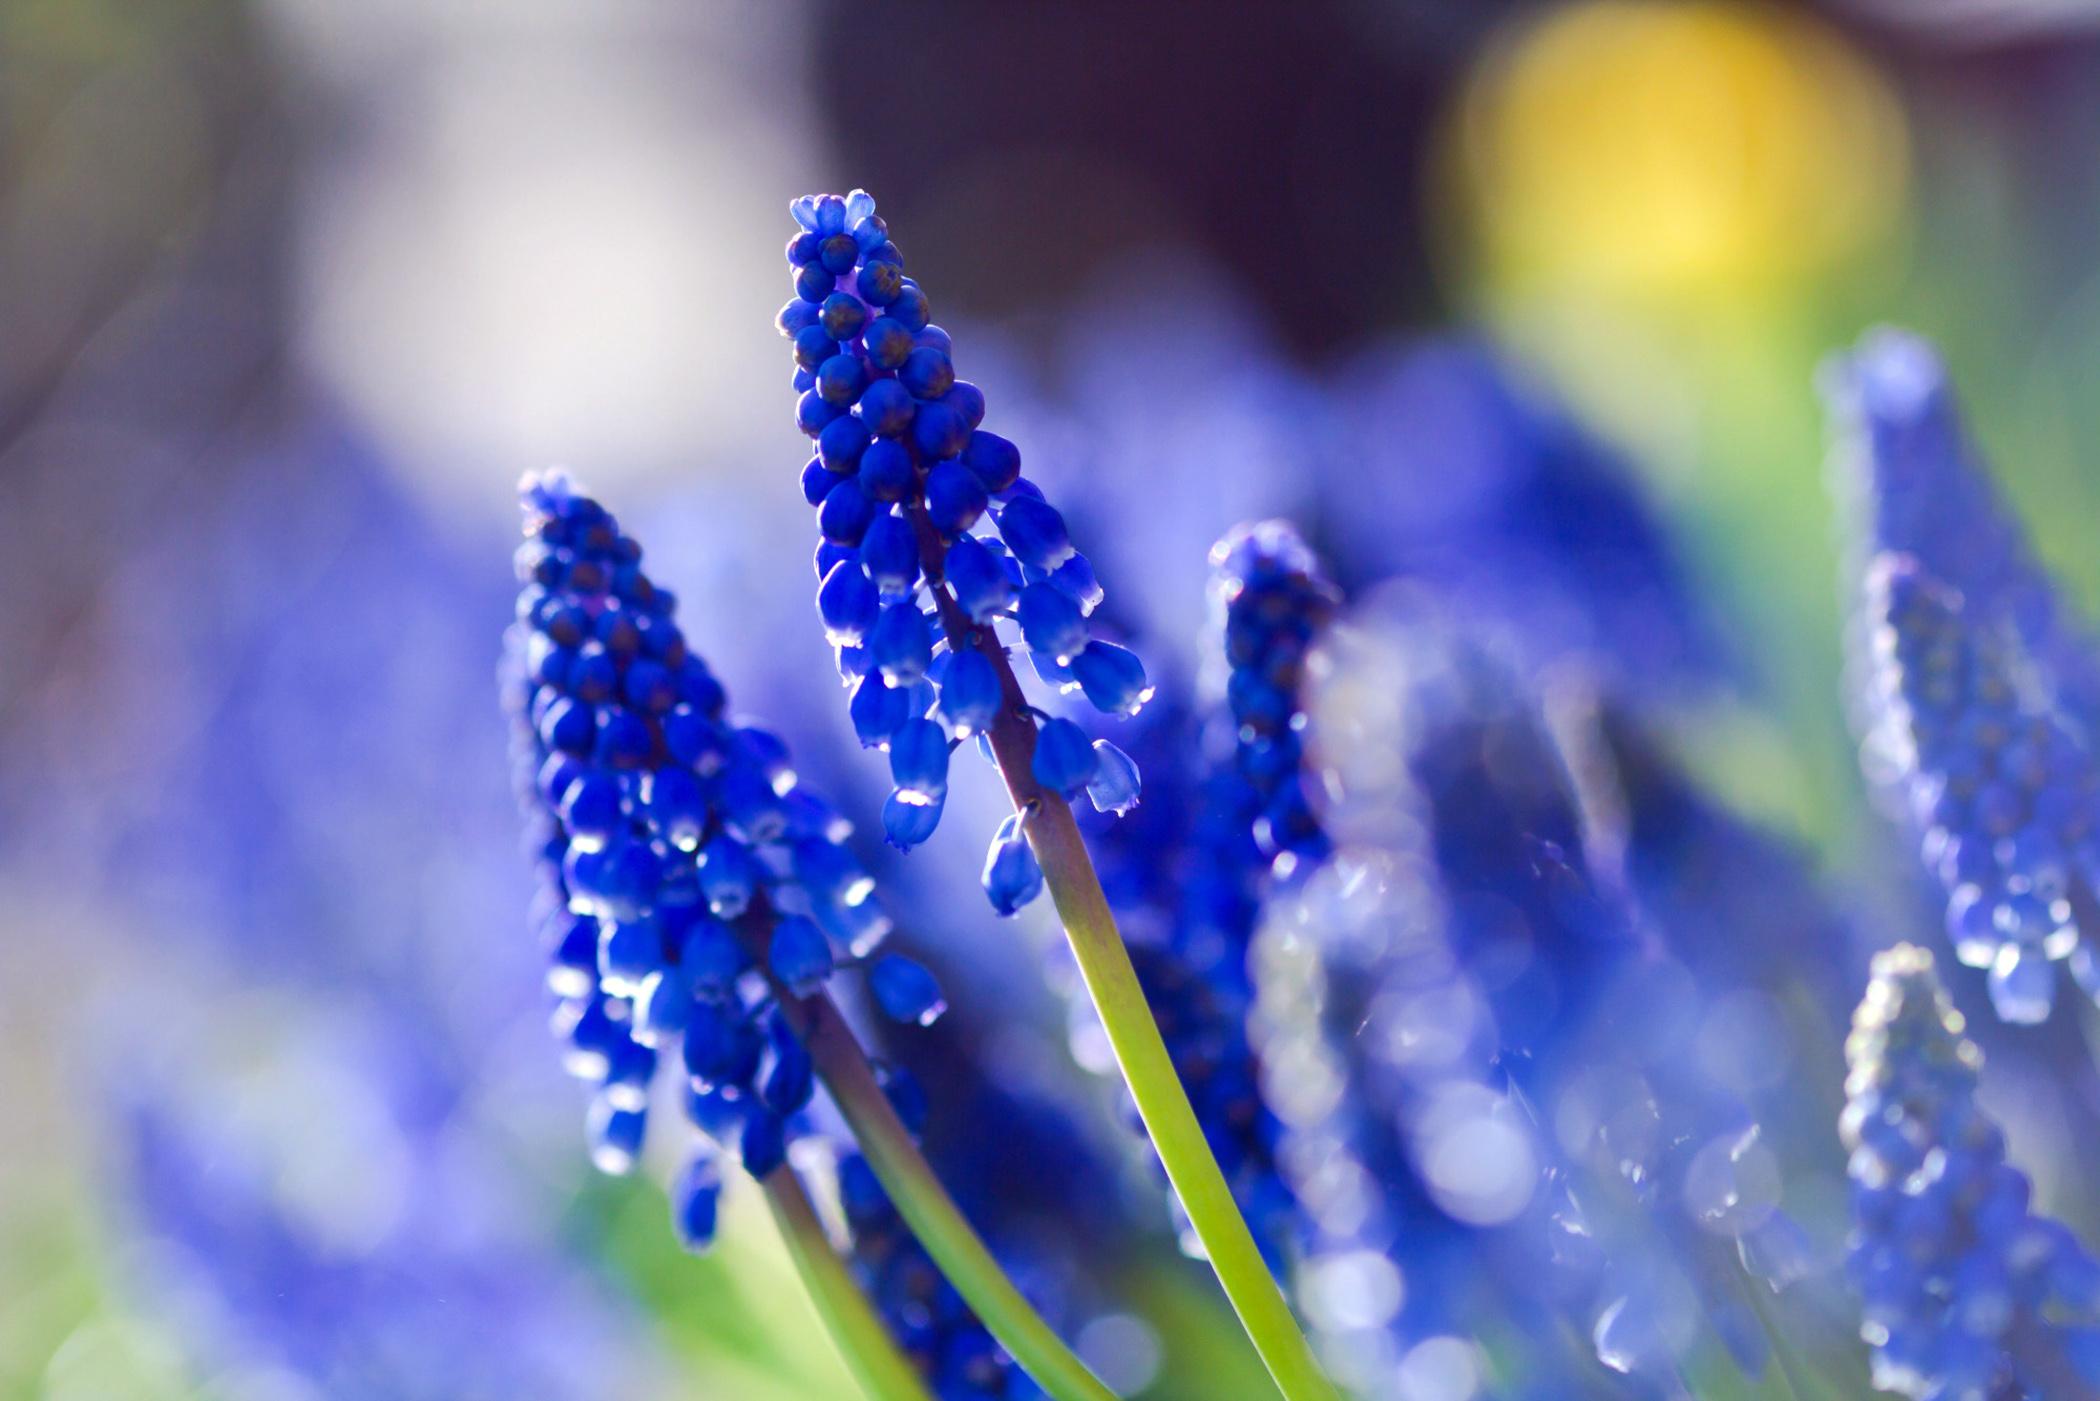 Mėlynai žydinti gėlė žydrė